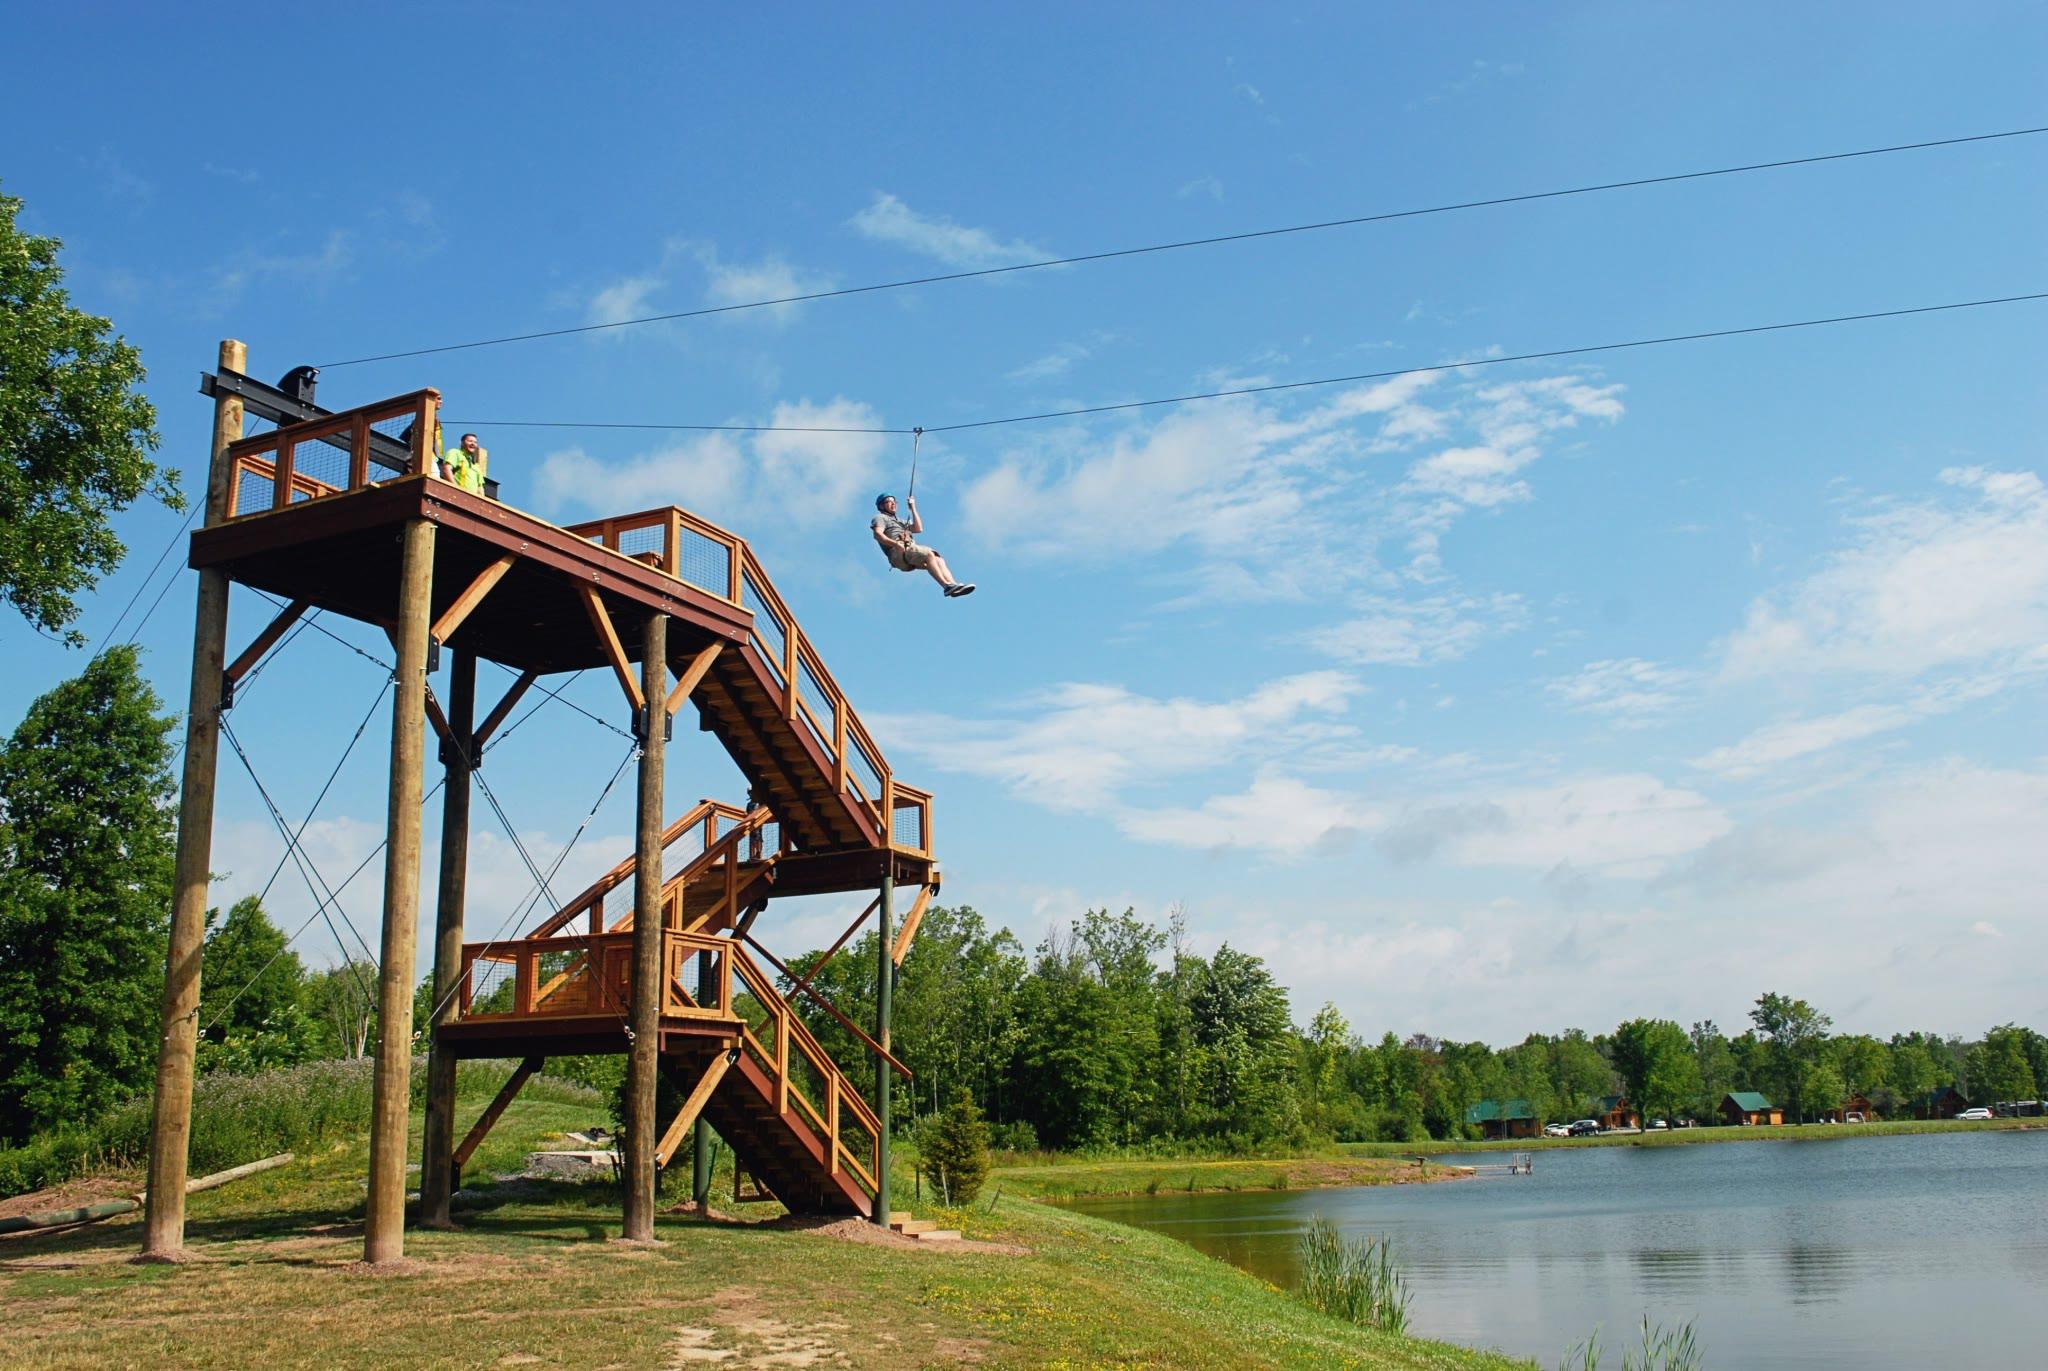 person descending on a zipline